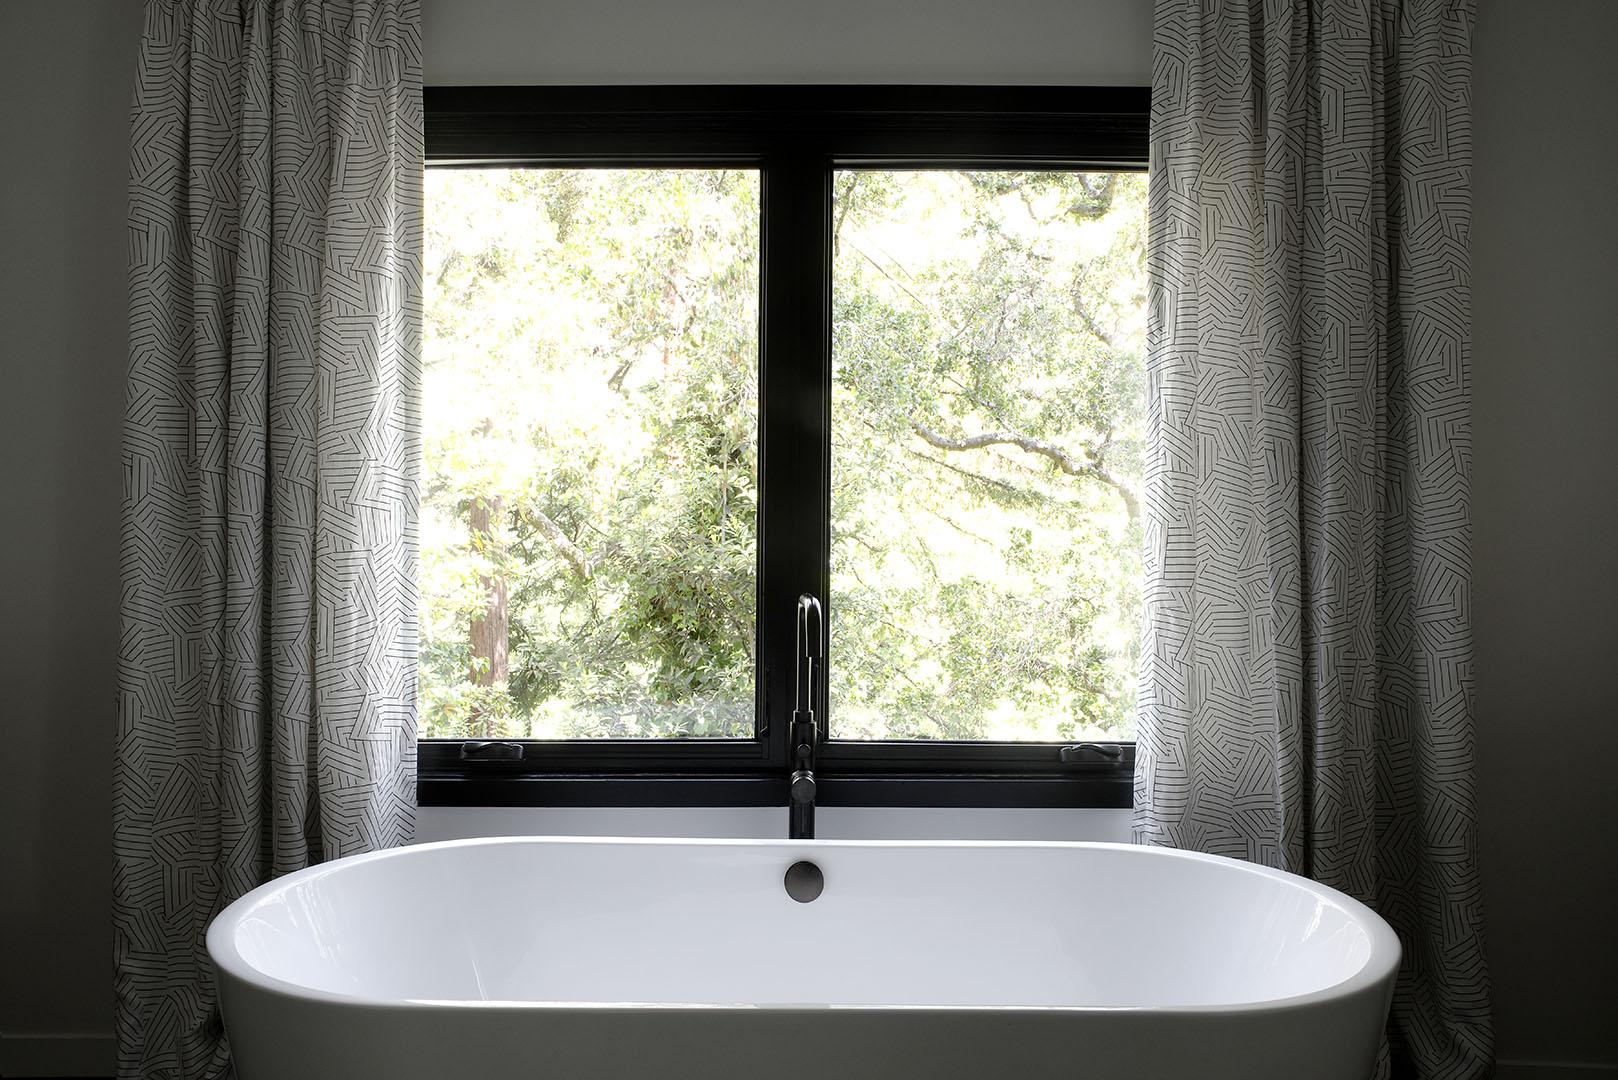 Master bathroom tub design in Oakland, CA